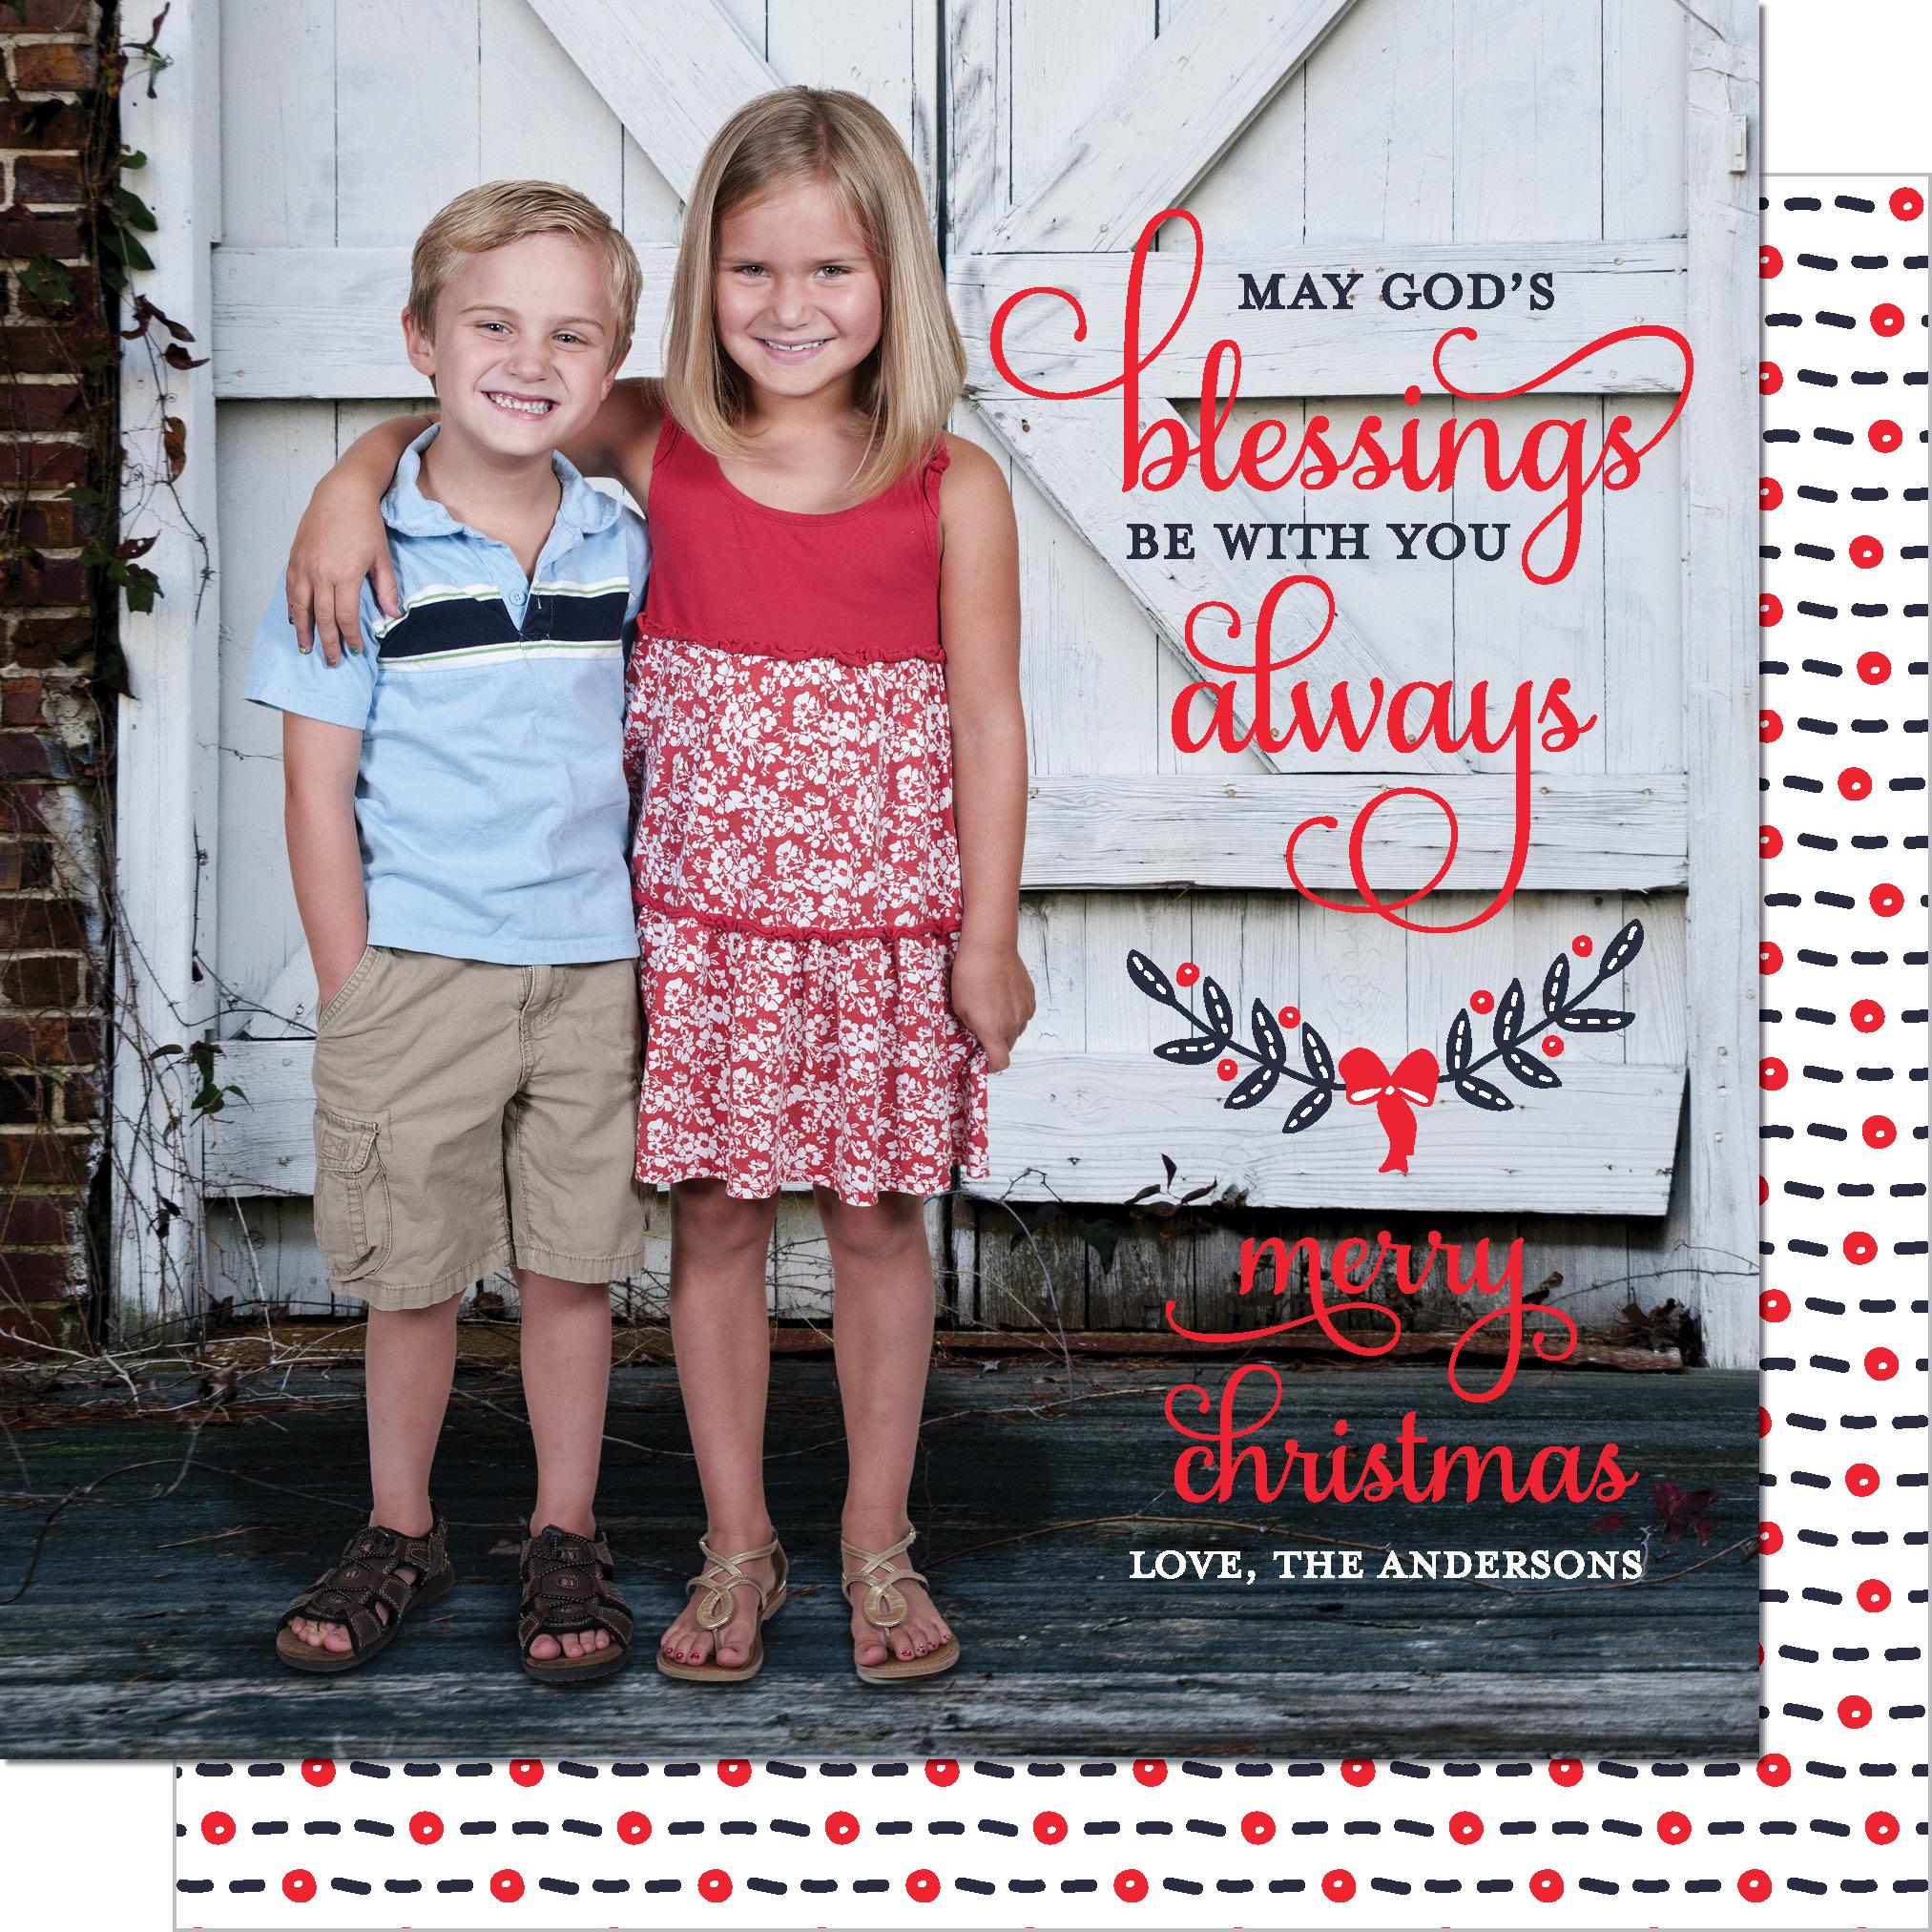 KD5174INXL-PB Blessings